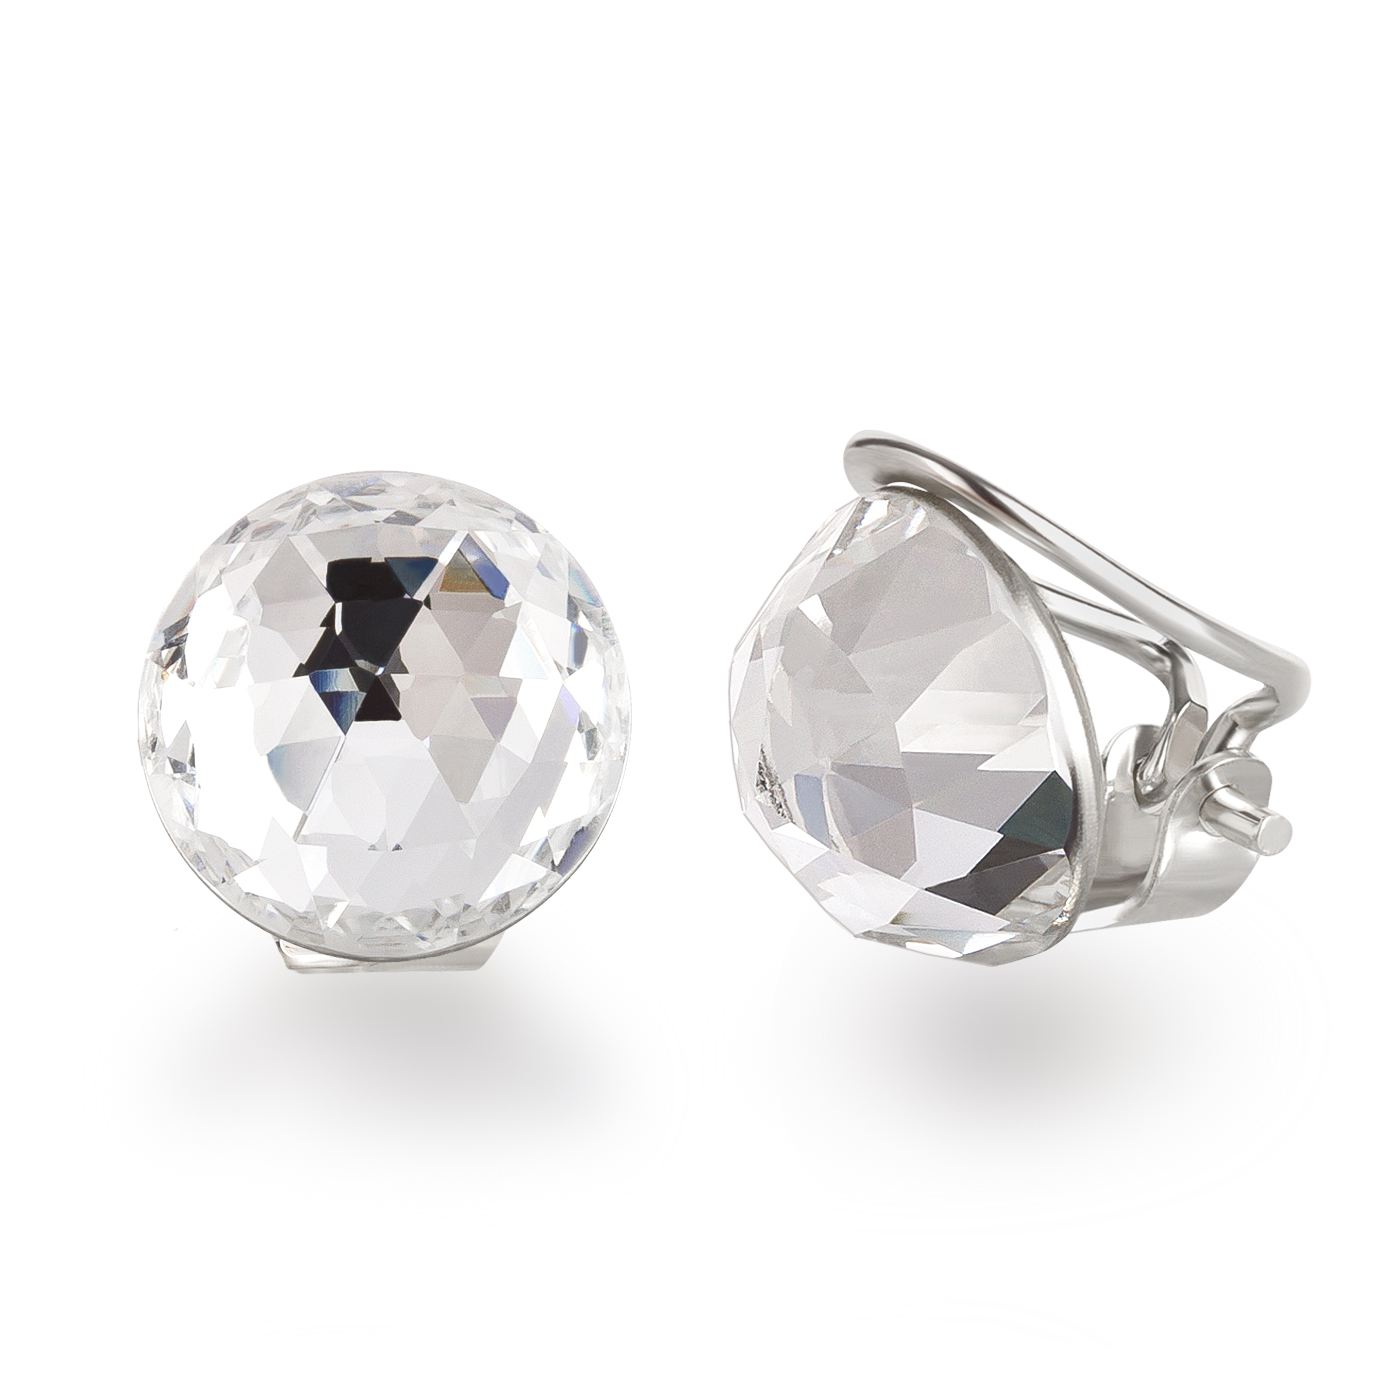 Ohrclips  Ohrclips aus 925 Silber mit SWAROVSKI ELEMENTS Kristall - Ohrringe ...